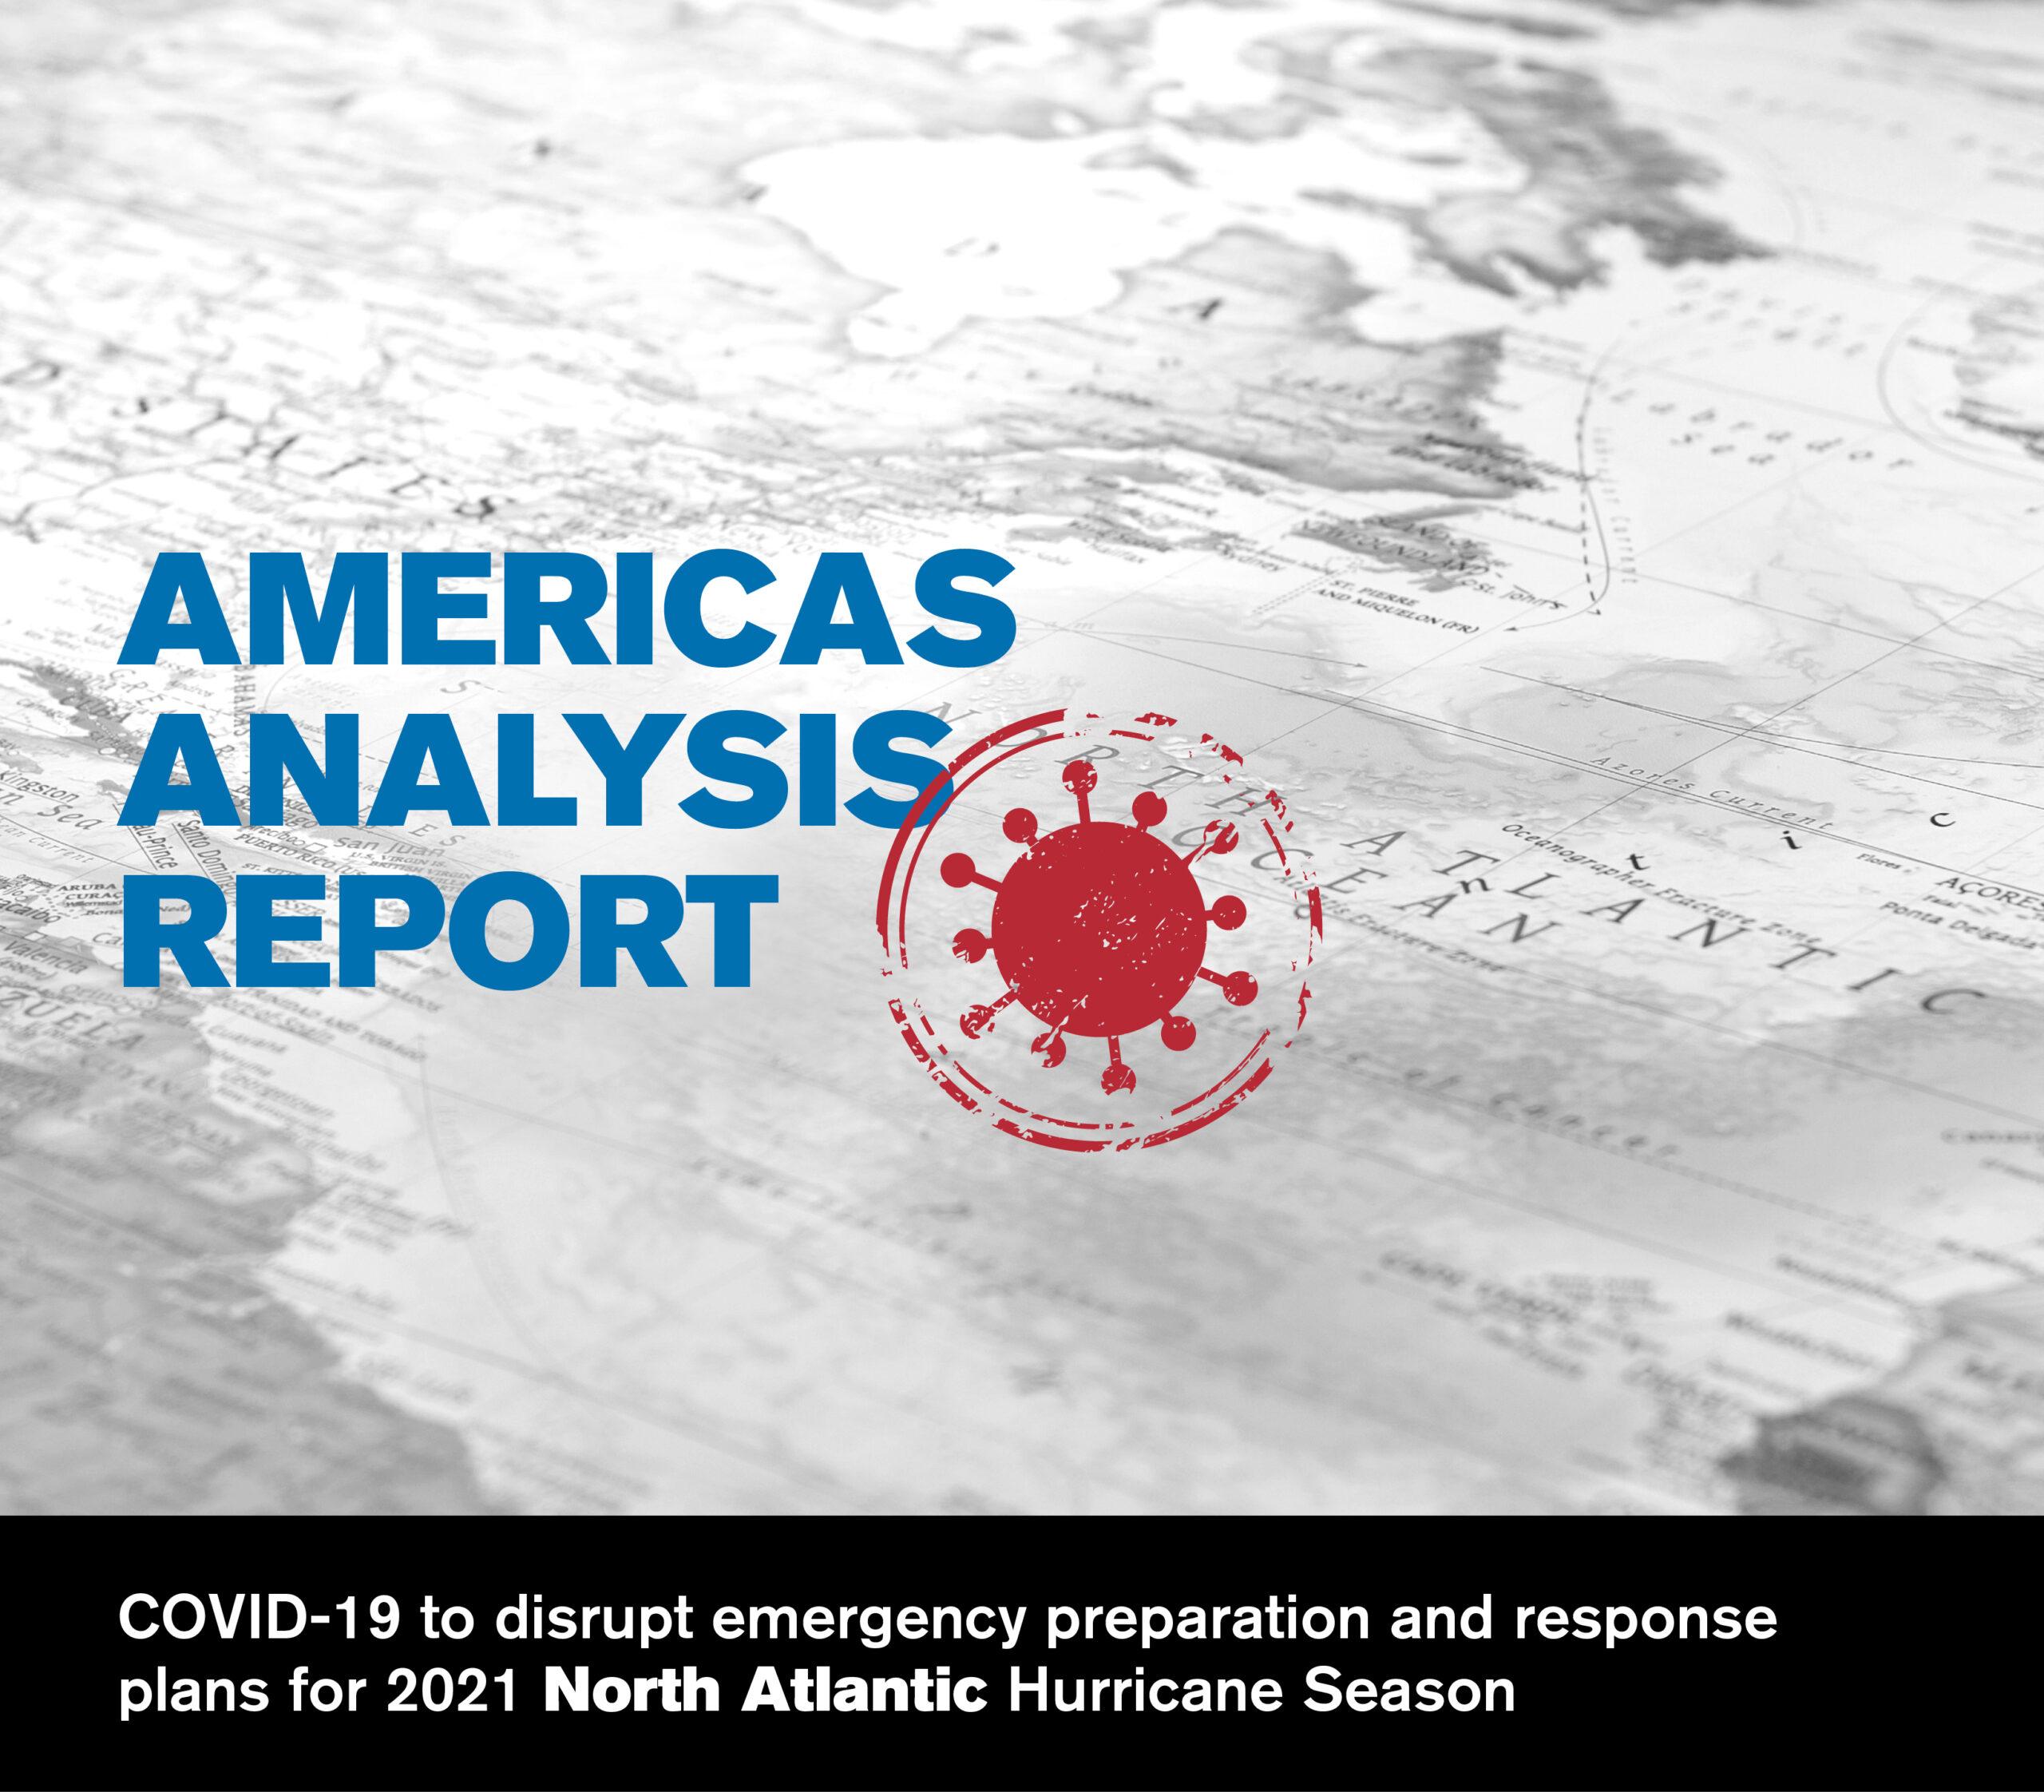 COVID-19 to disrupt emergency preparation and response plans for 2021 North Atlantic Hurricane Season - Americas Analysis